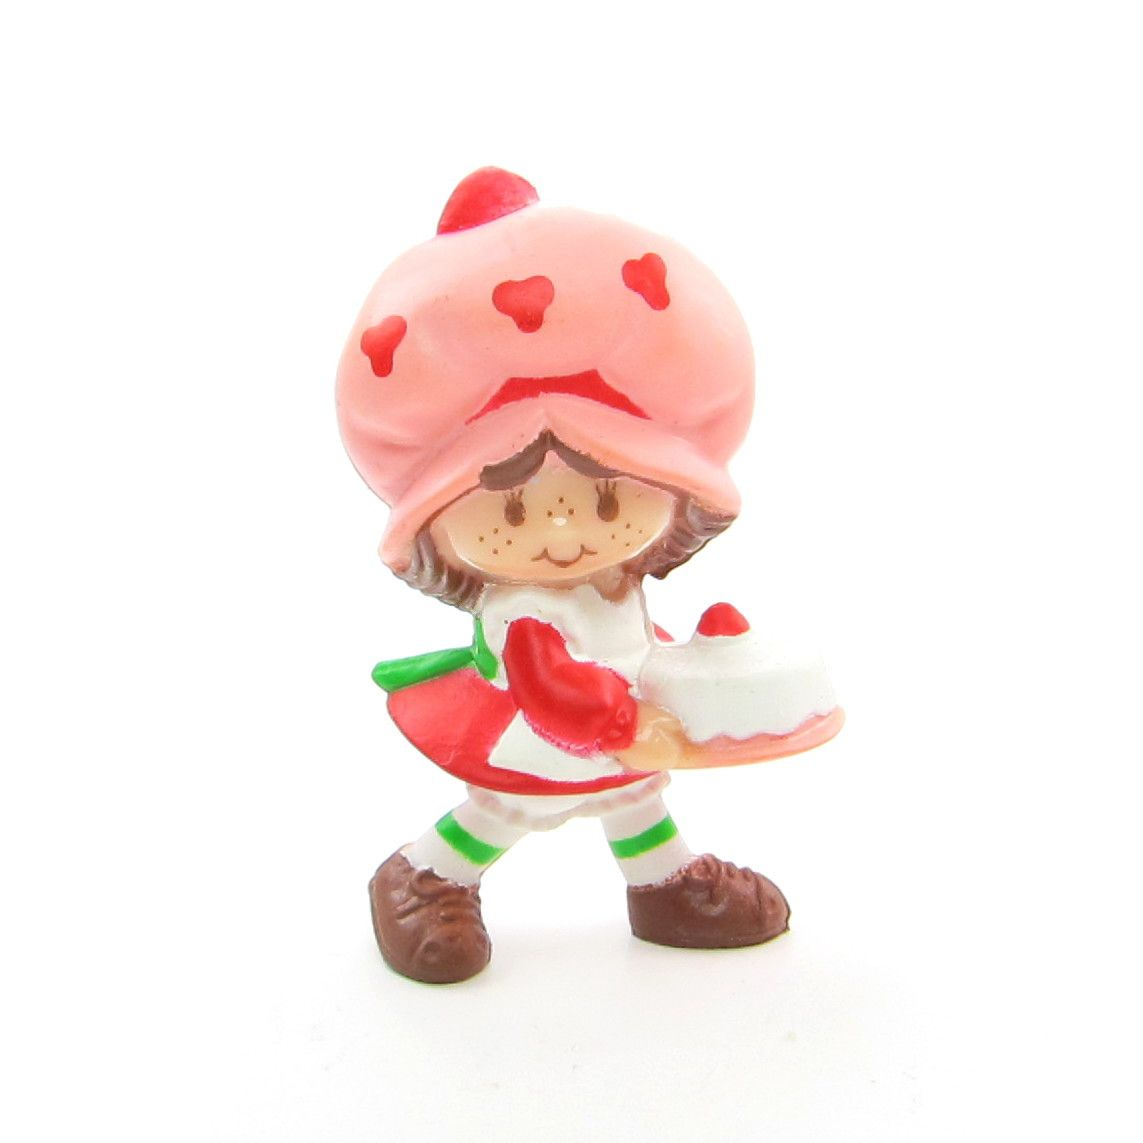 Strawberry Shortcake with a birthday cake figurine